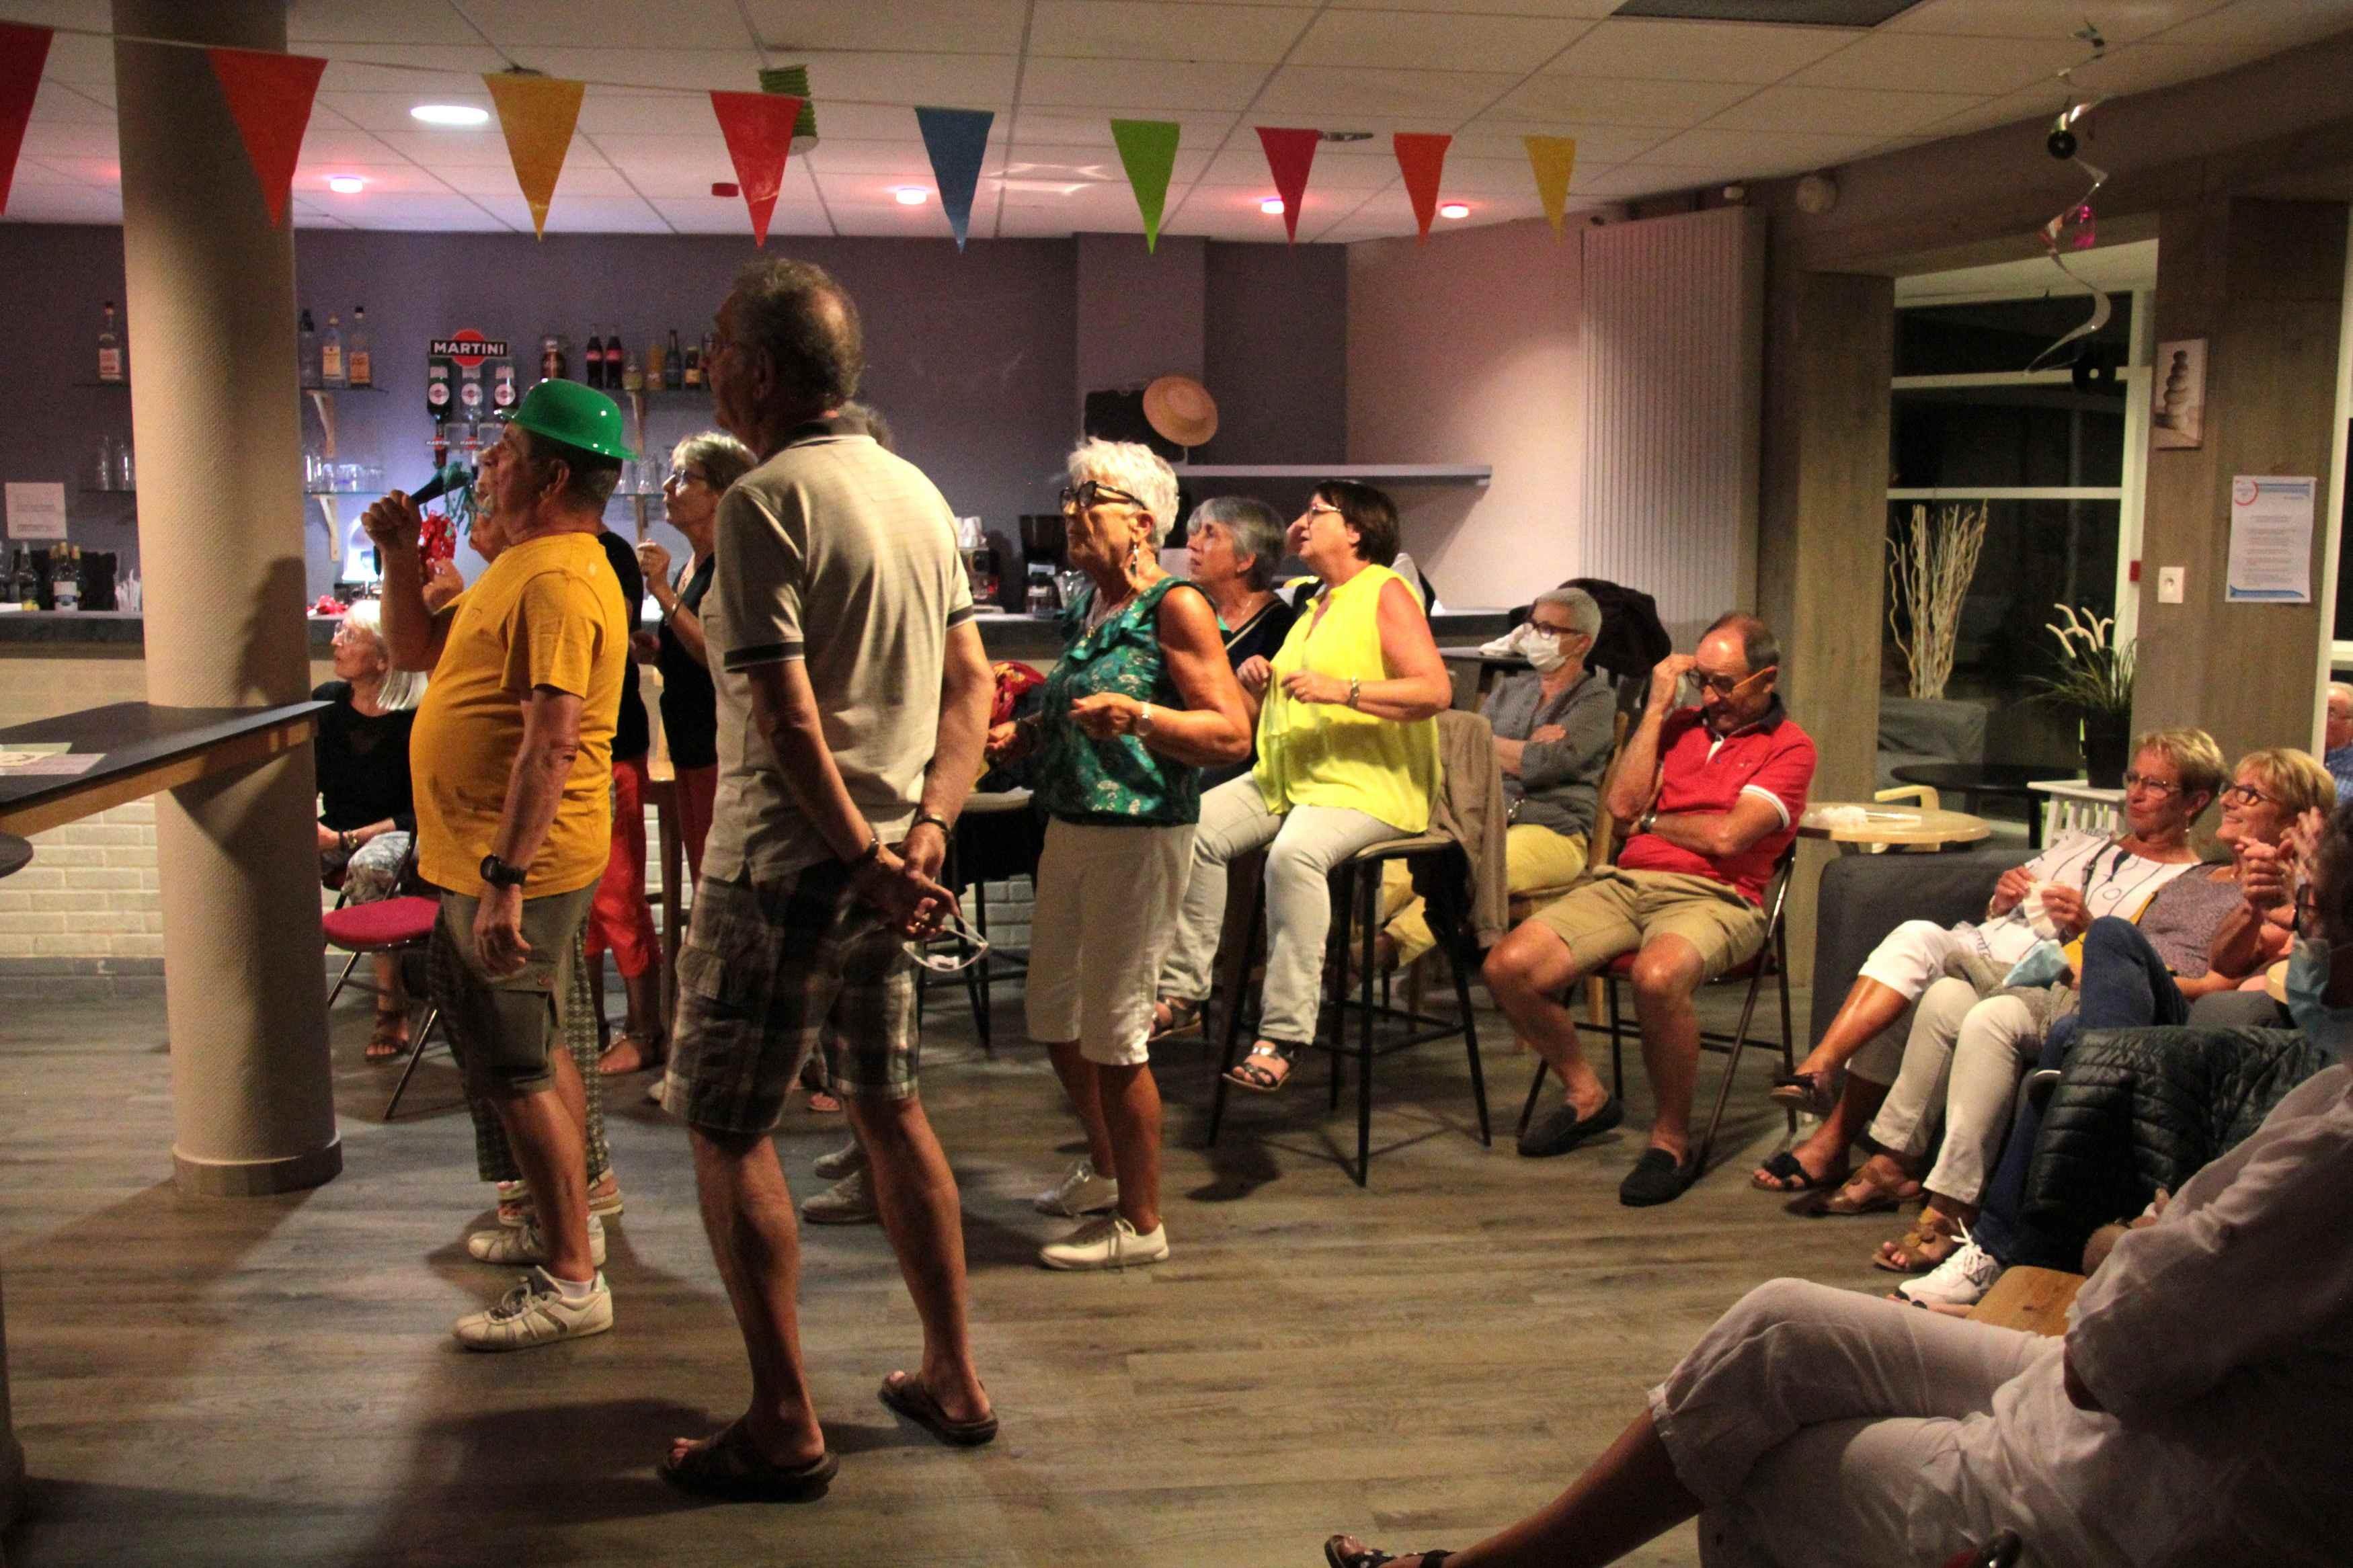 2020 09 13 0640 m soiree karaoke les tourelles normandie 2